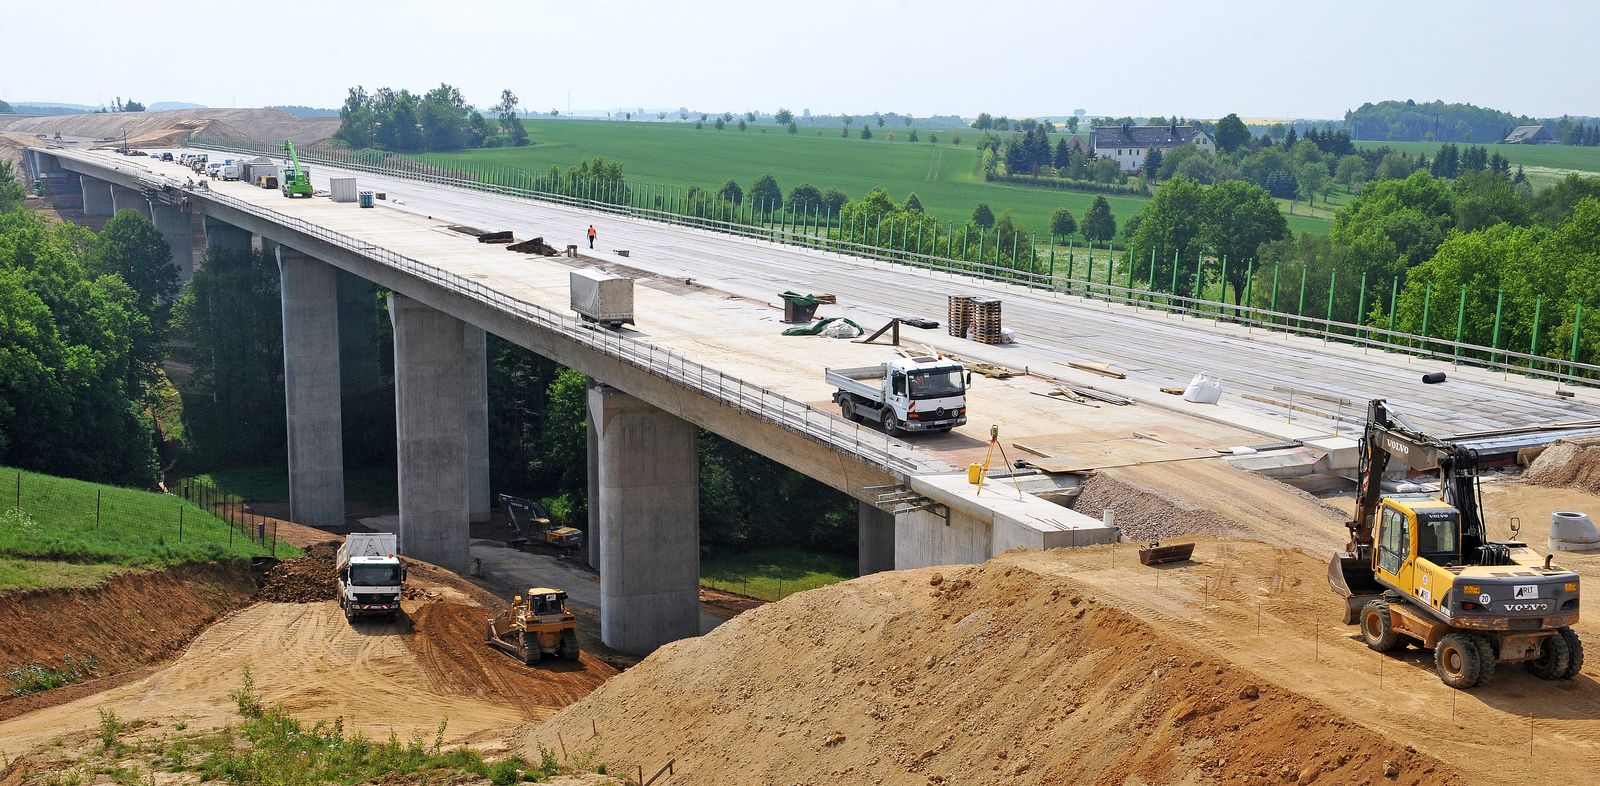 Strassenbau / Neubau der Autobahn 72 / Brückenbau